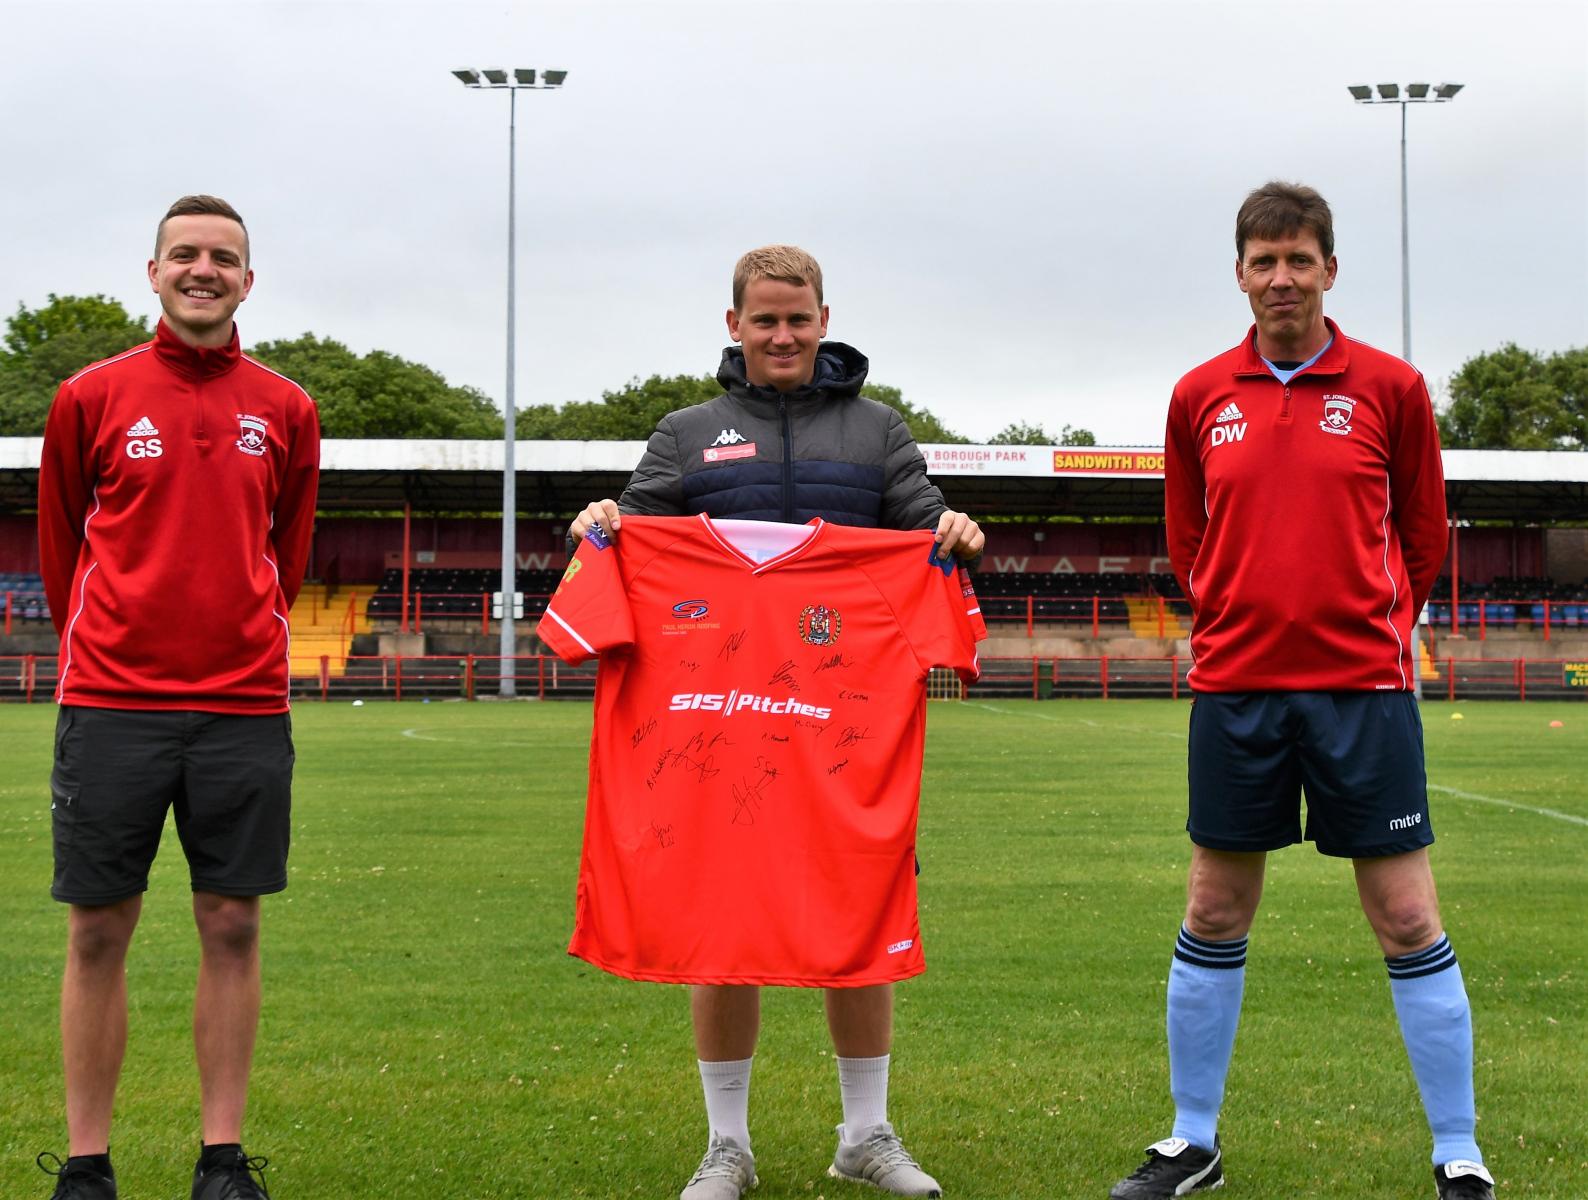 Shirt Presentation to St Josephs Blues Walking Football team